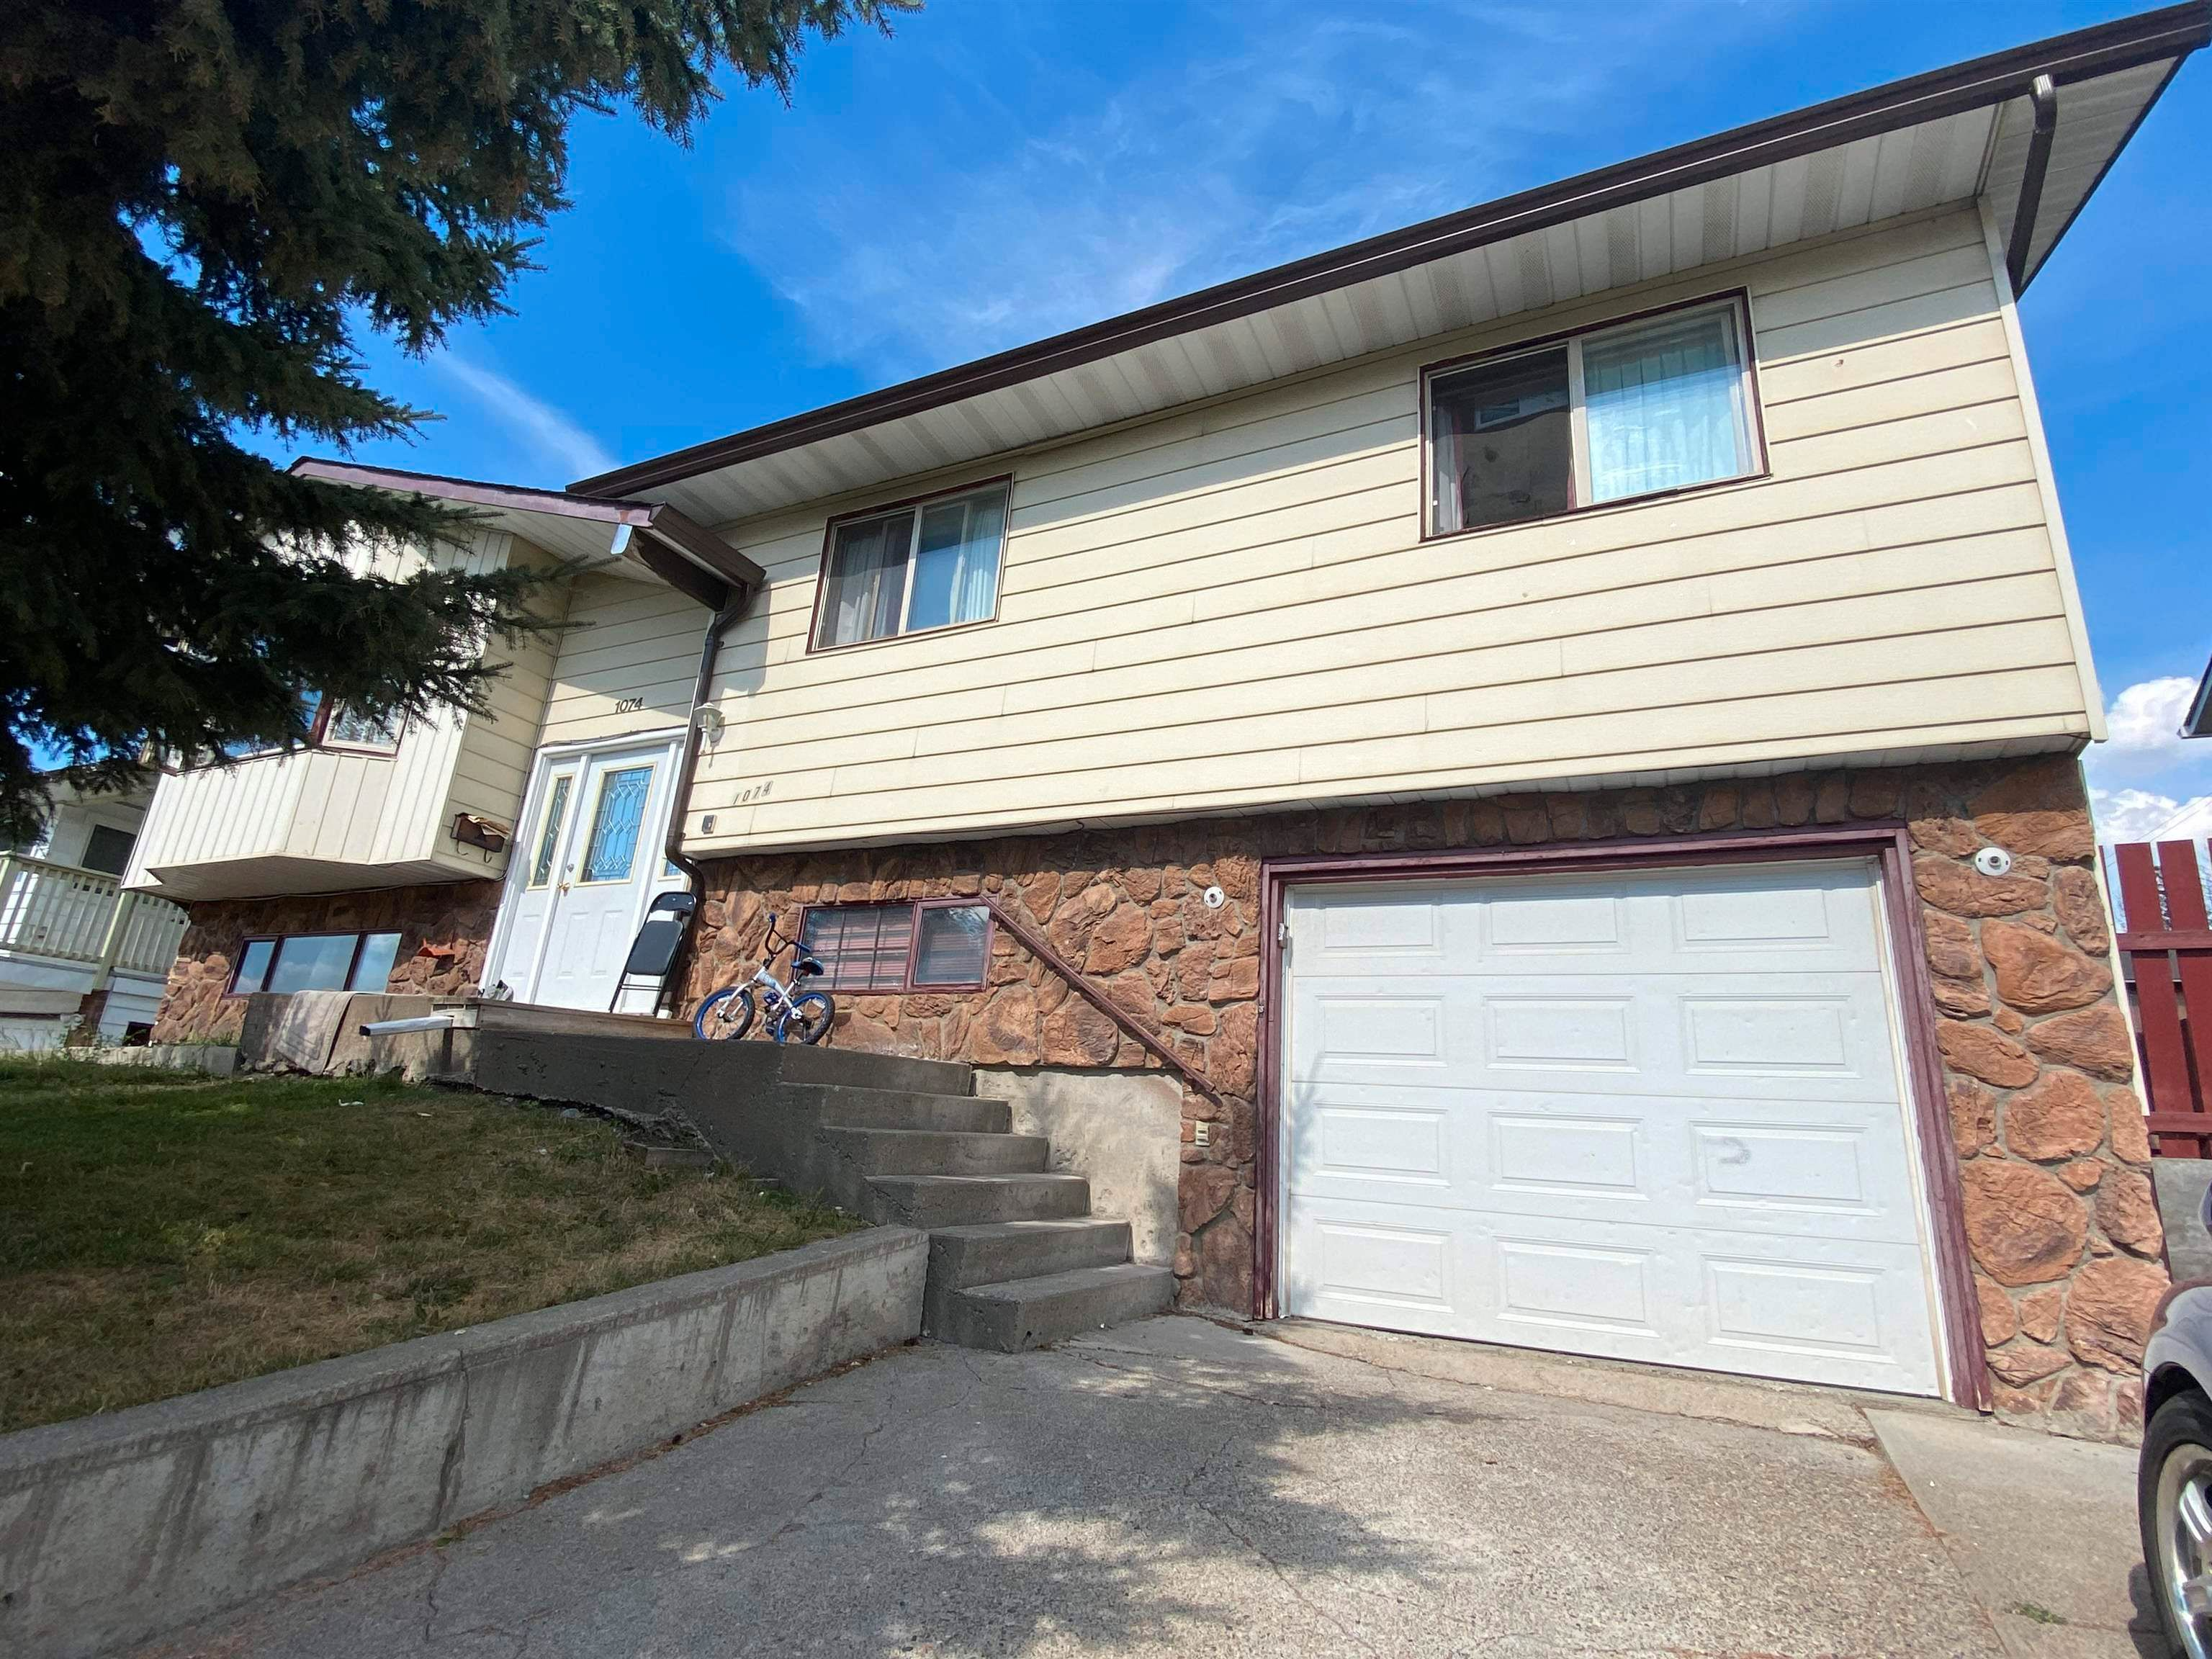 Main Photo: 1074 MOXON Place in Williams Lake: Williams Lake - City House for sale (Williams Lake (Zone 27))  : MLS®# R2612718